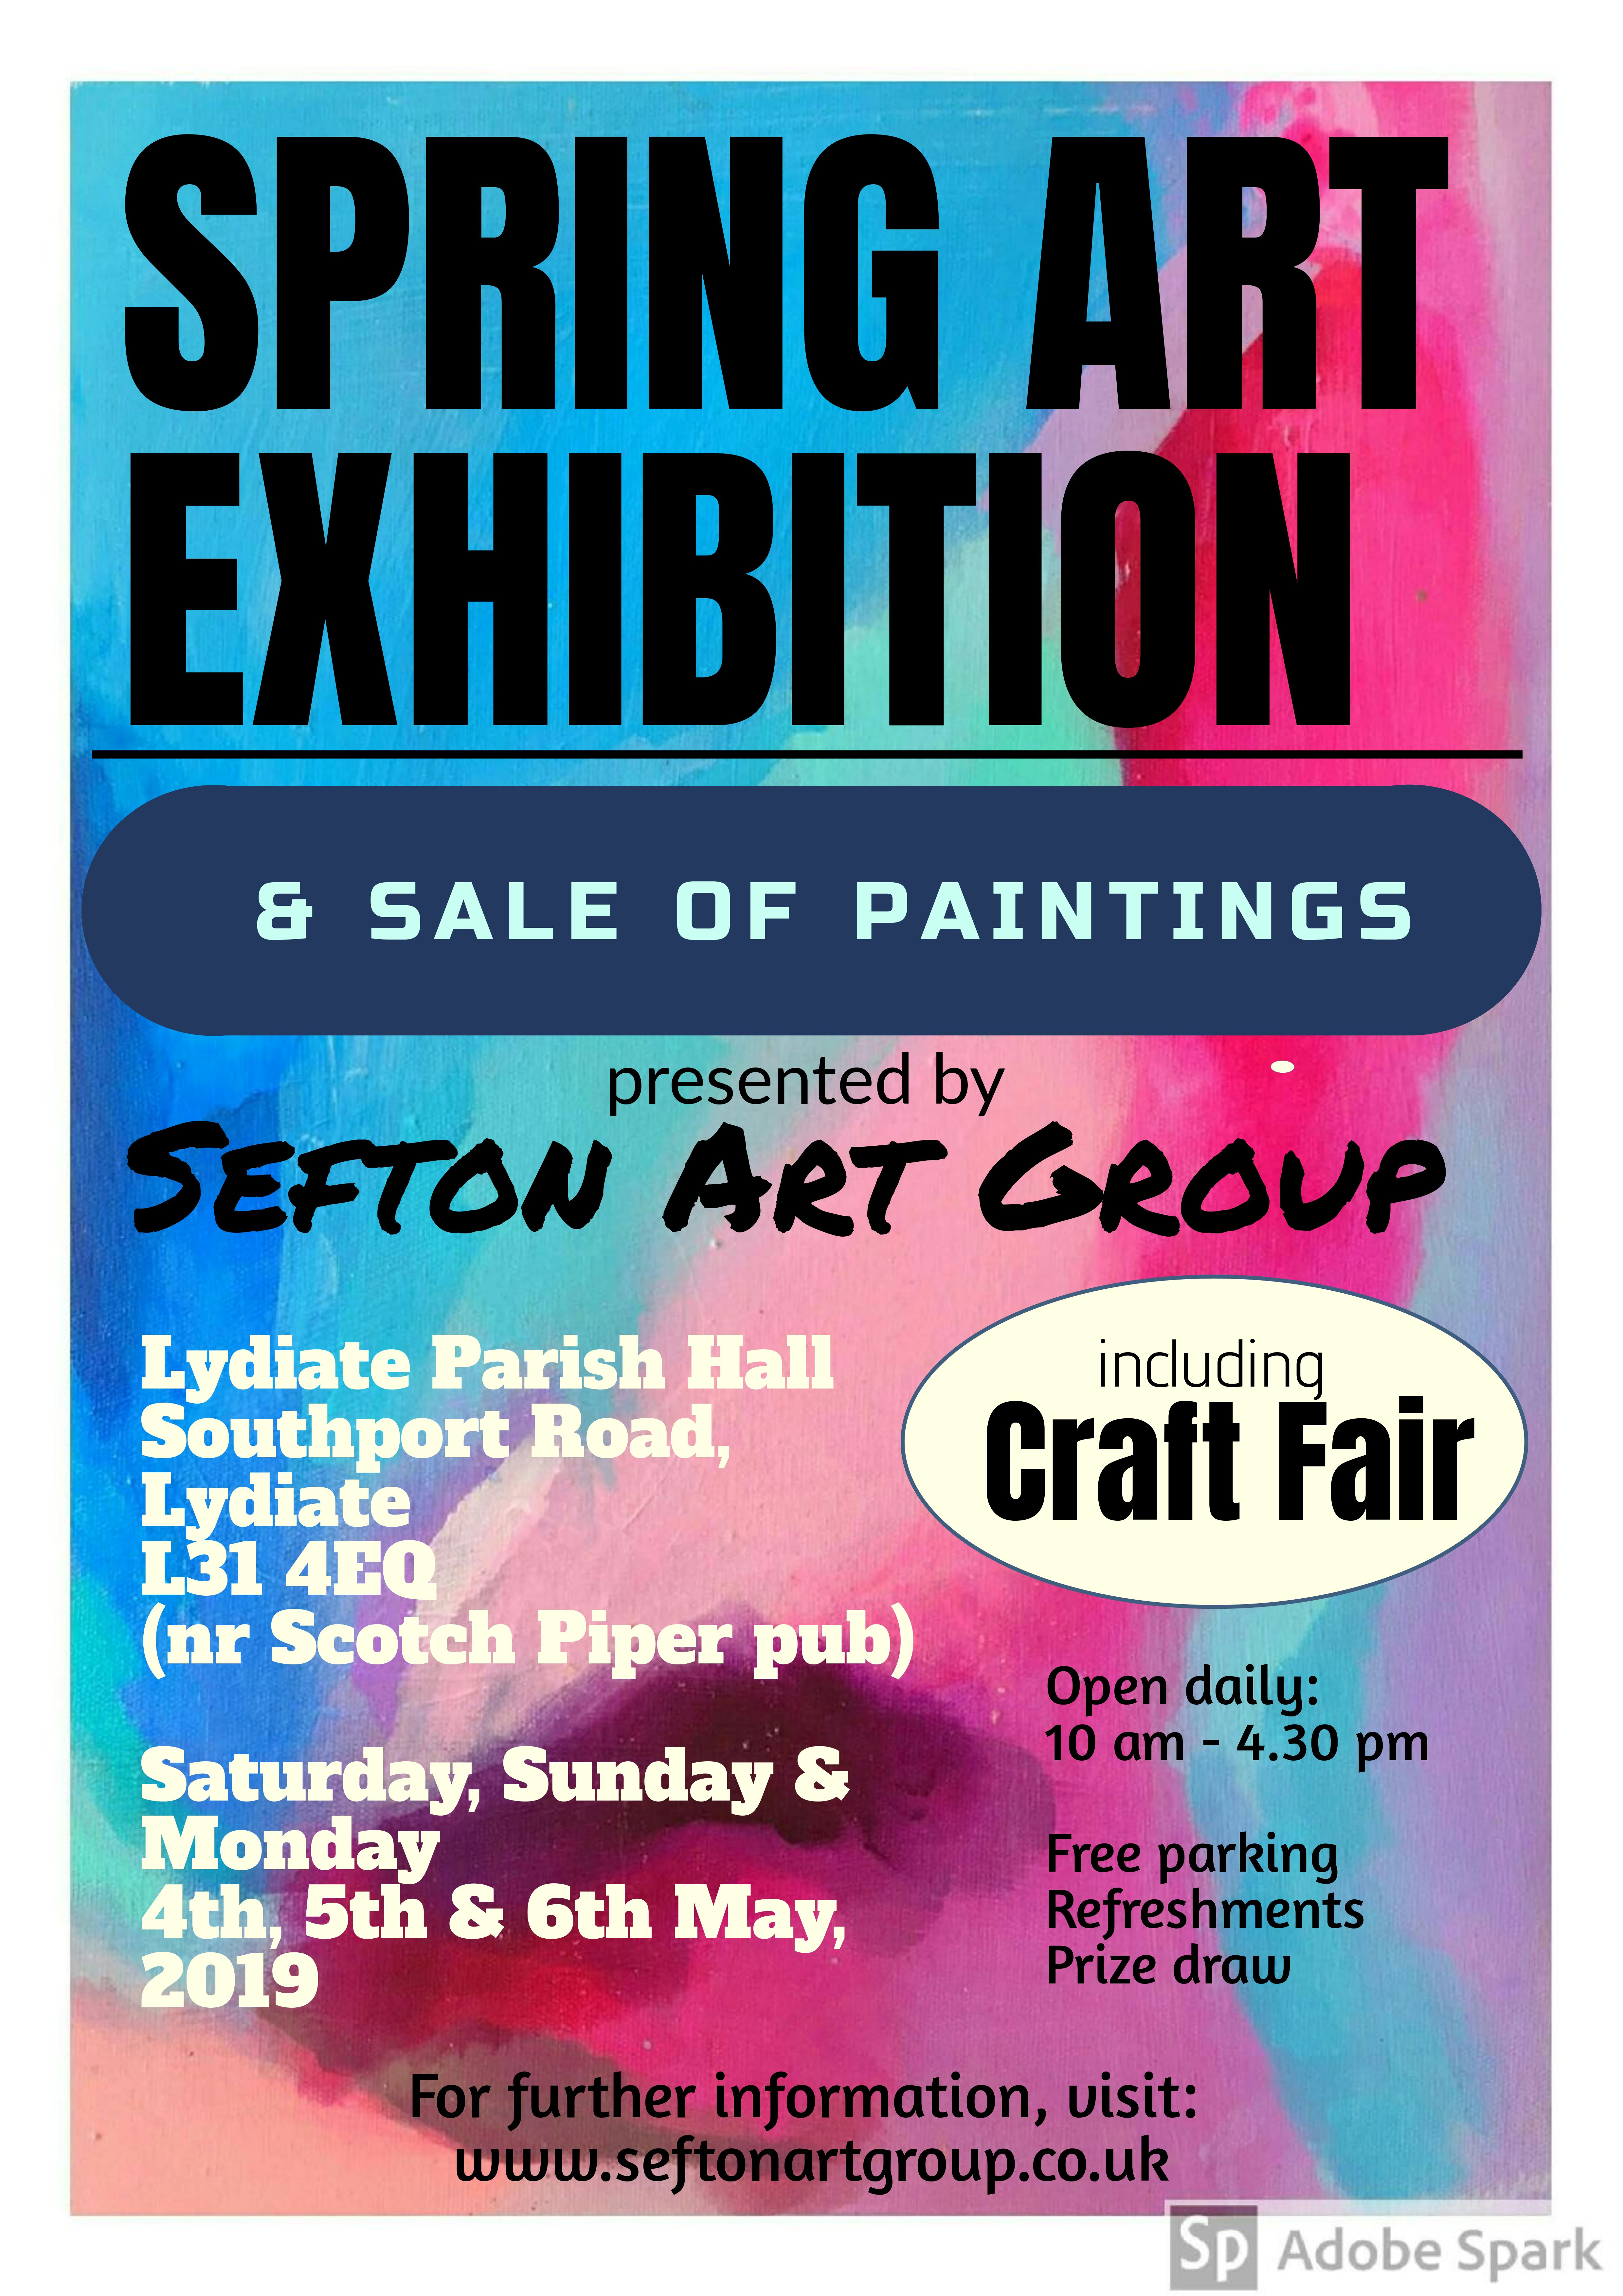 art exhibition, near me, ormsirk, liverpool, southport, merseyside, sefton, lancashire